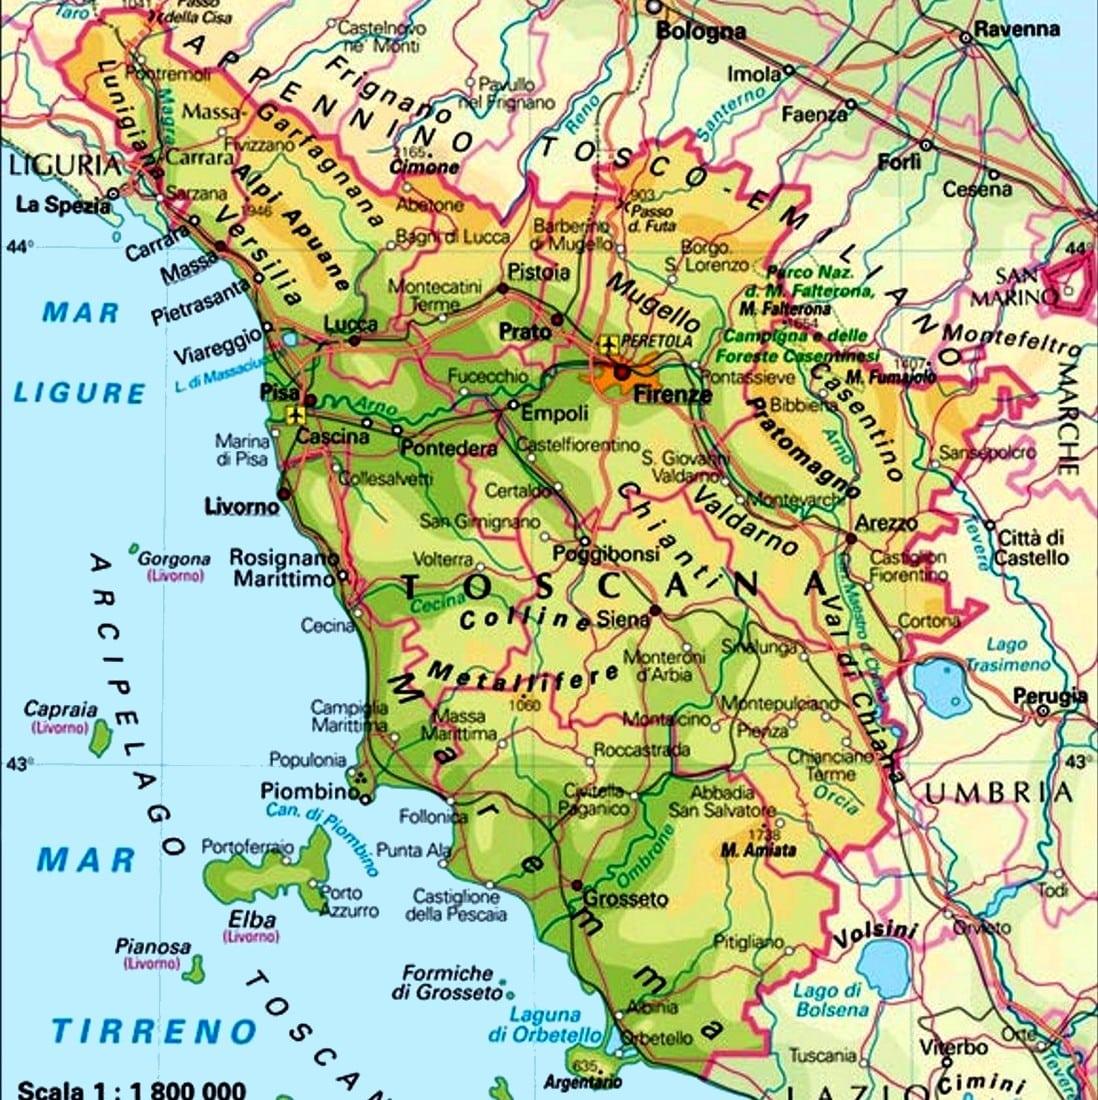 Cartina Toscana Dettagliata.Mappa Turistica Di Firenze Cartina Geografica Centro Storico